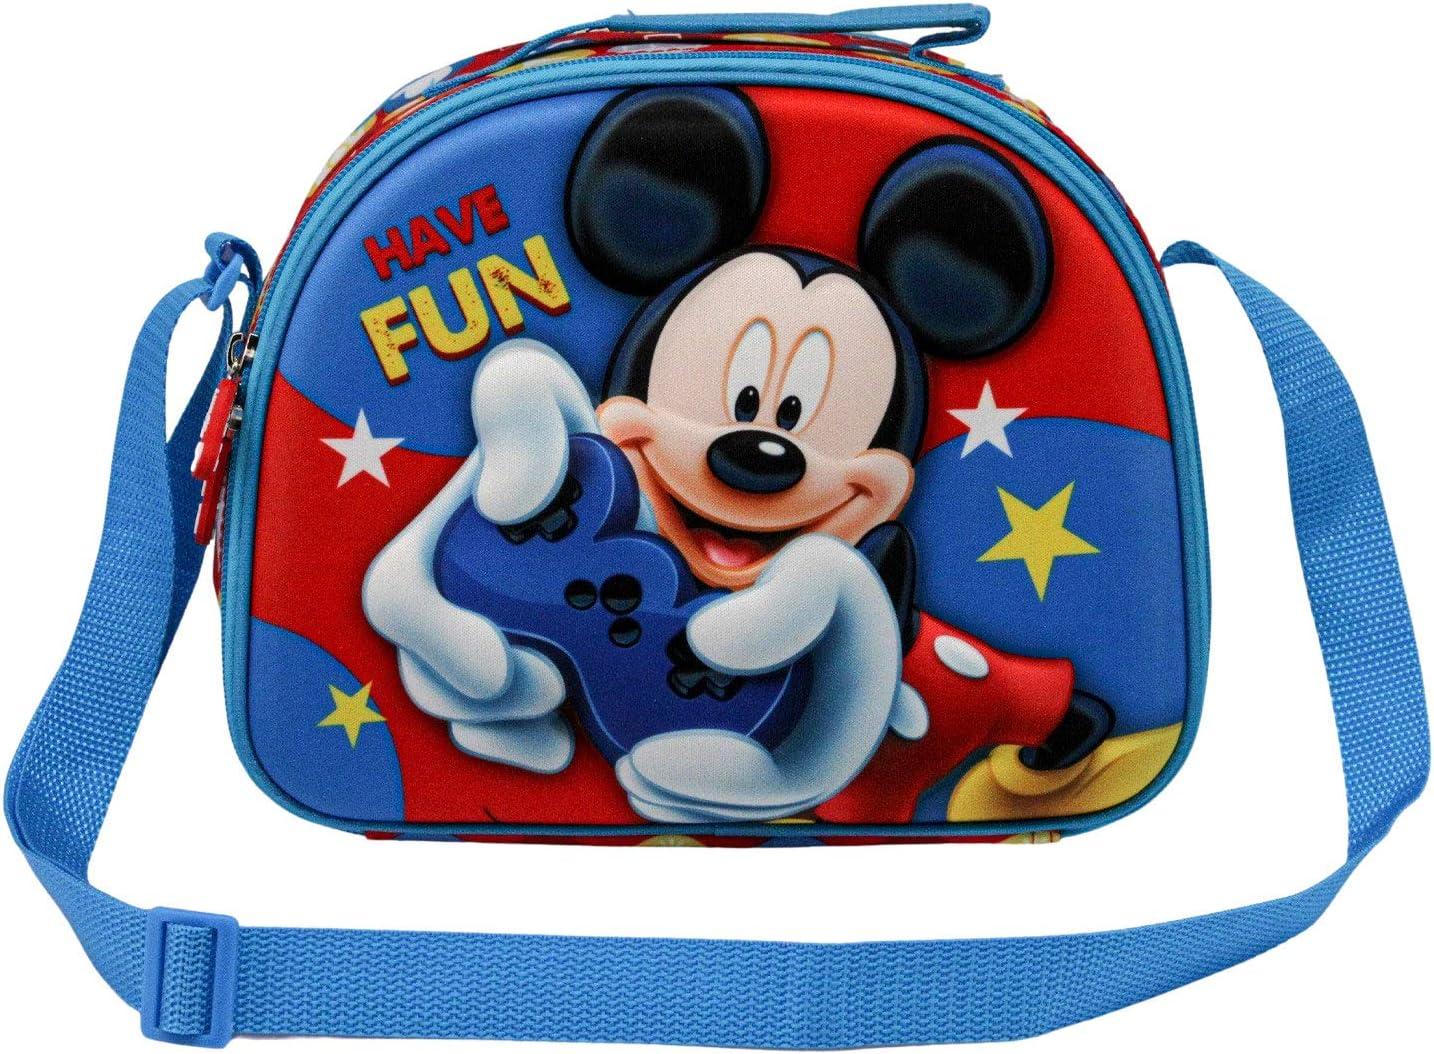 KARACTERMANIA Mickey Mouse Gamer-Bolsa Portameriendas 3D, Multicolor